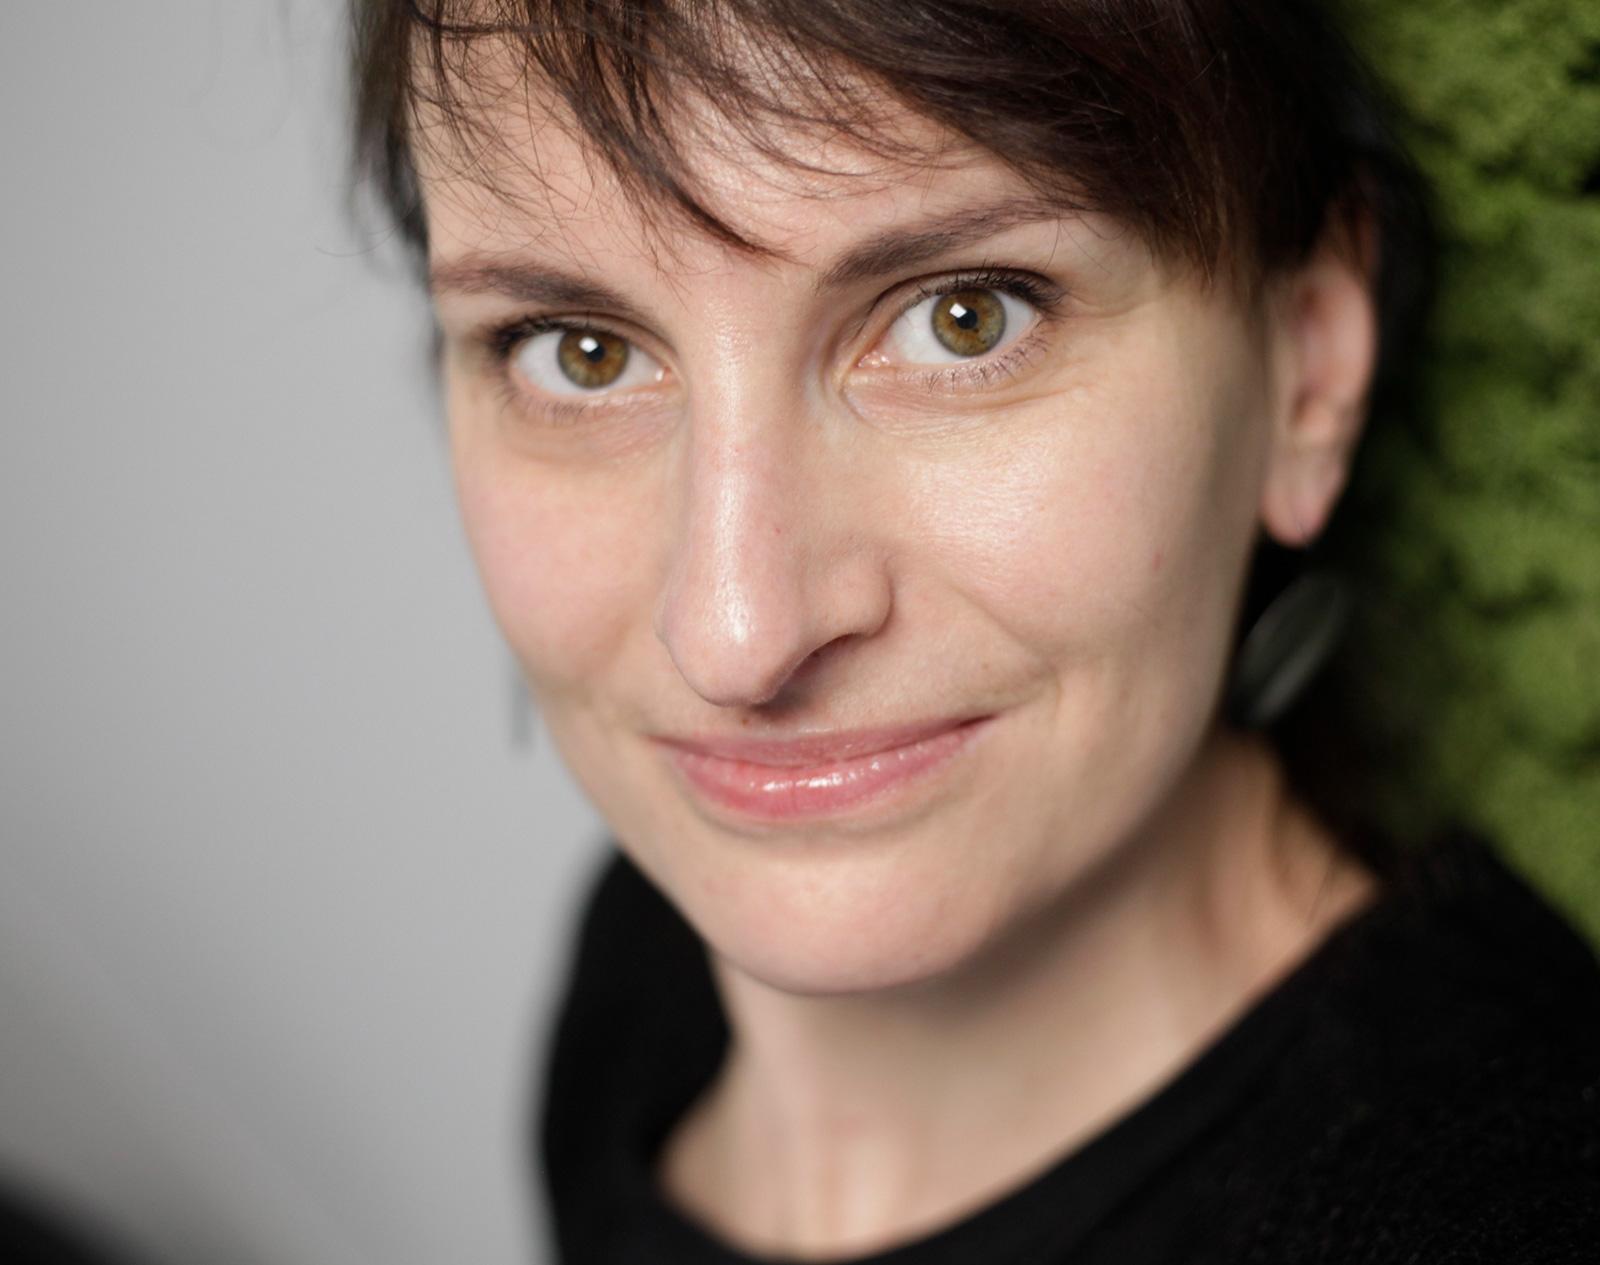 Agata Pakieła